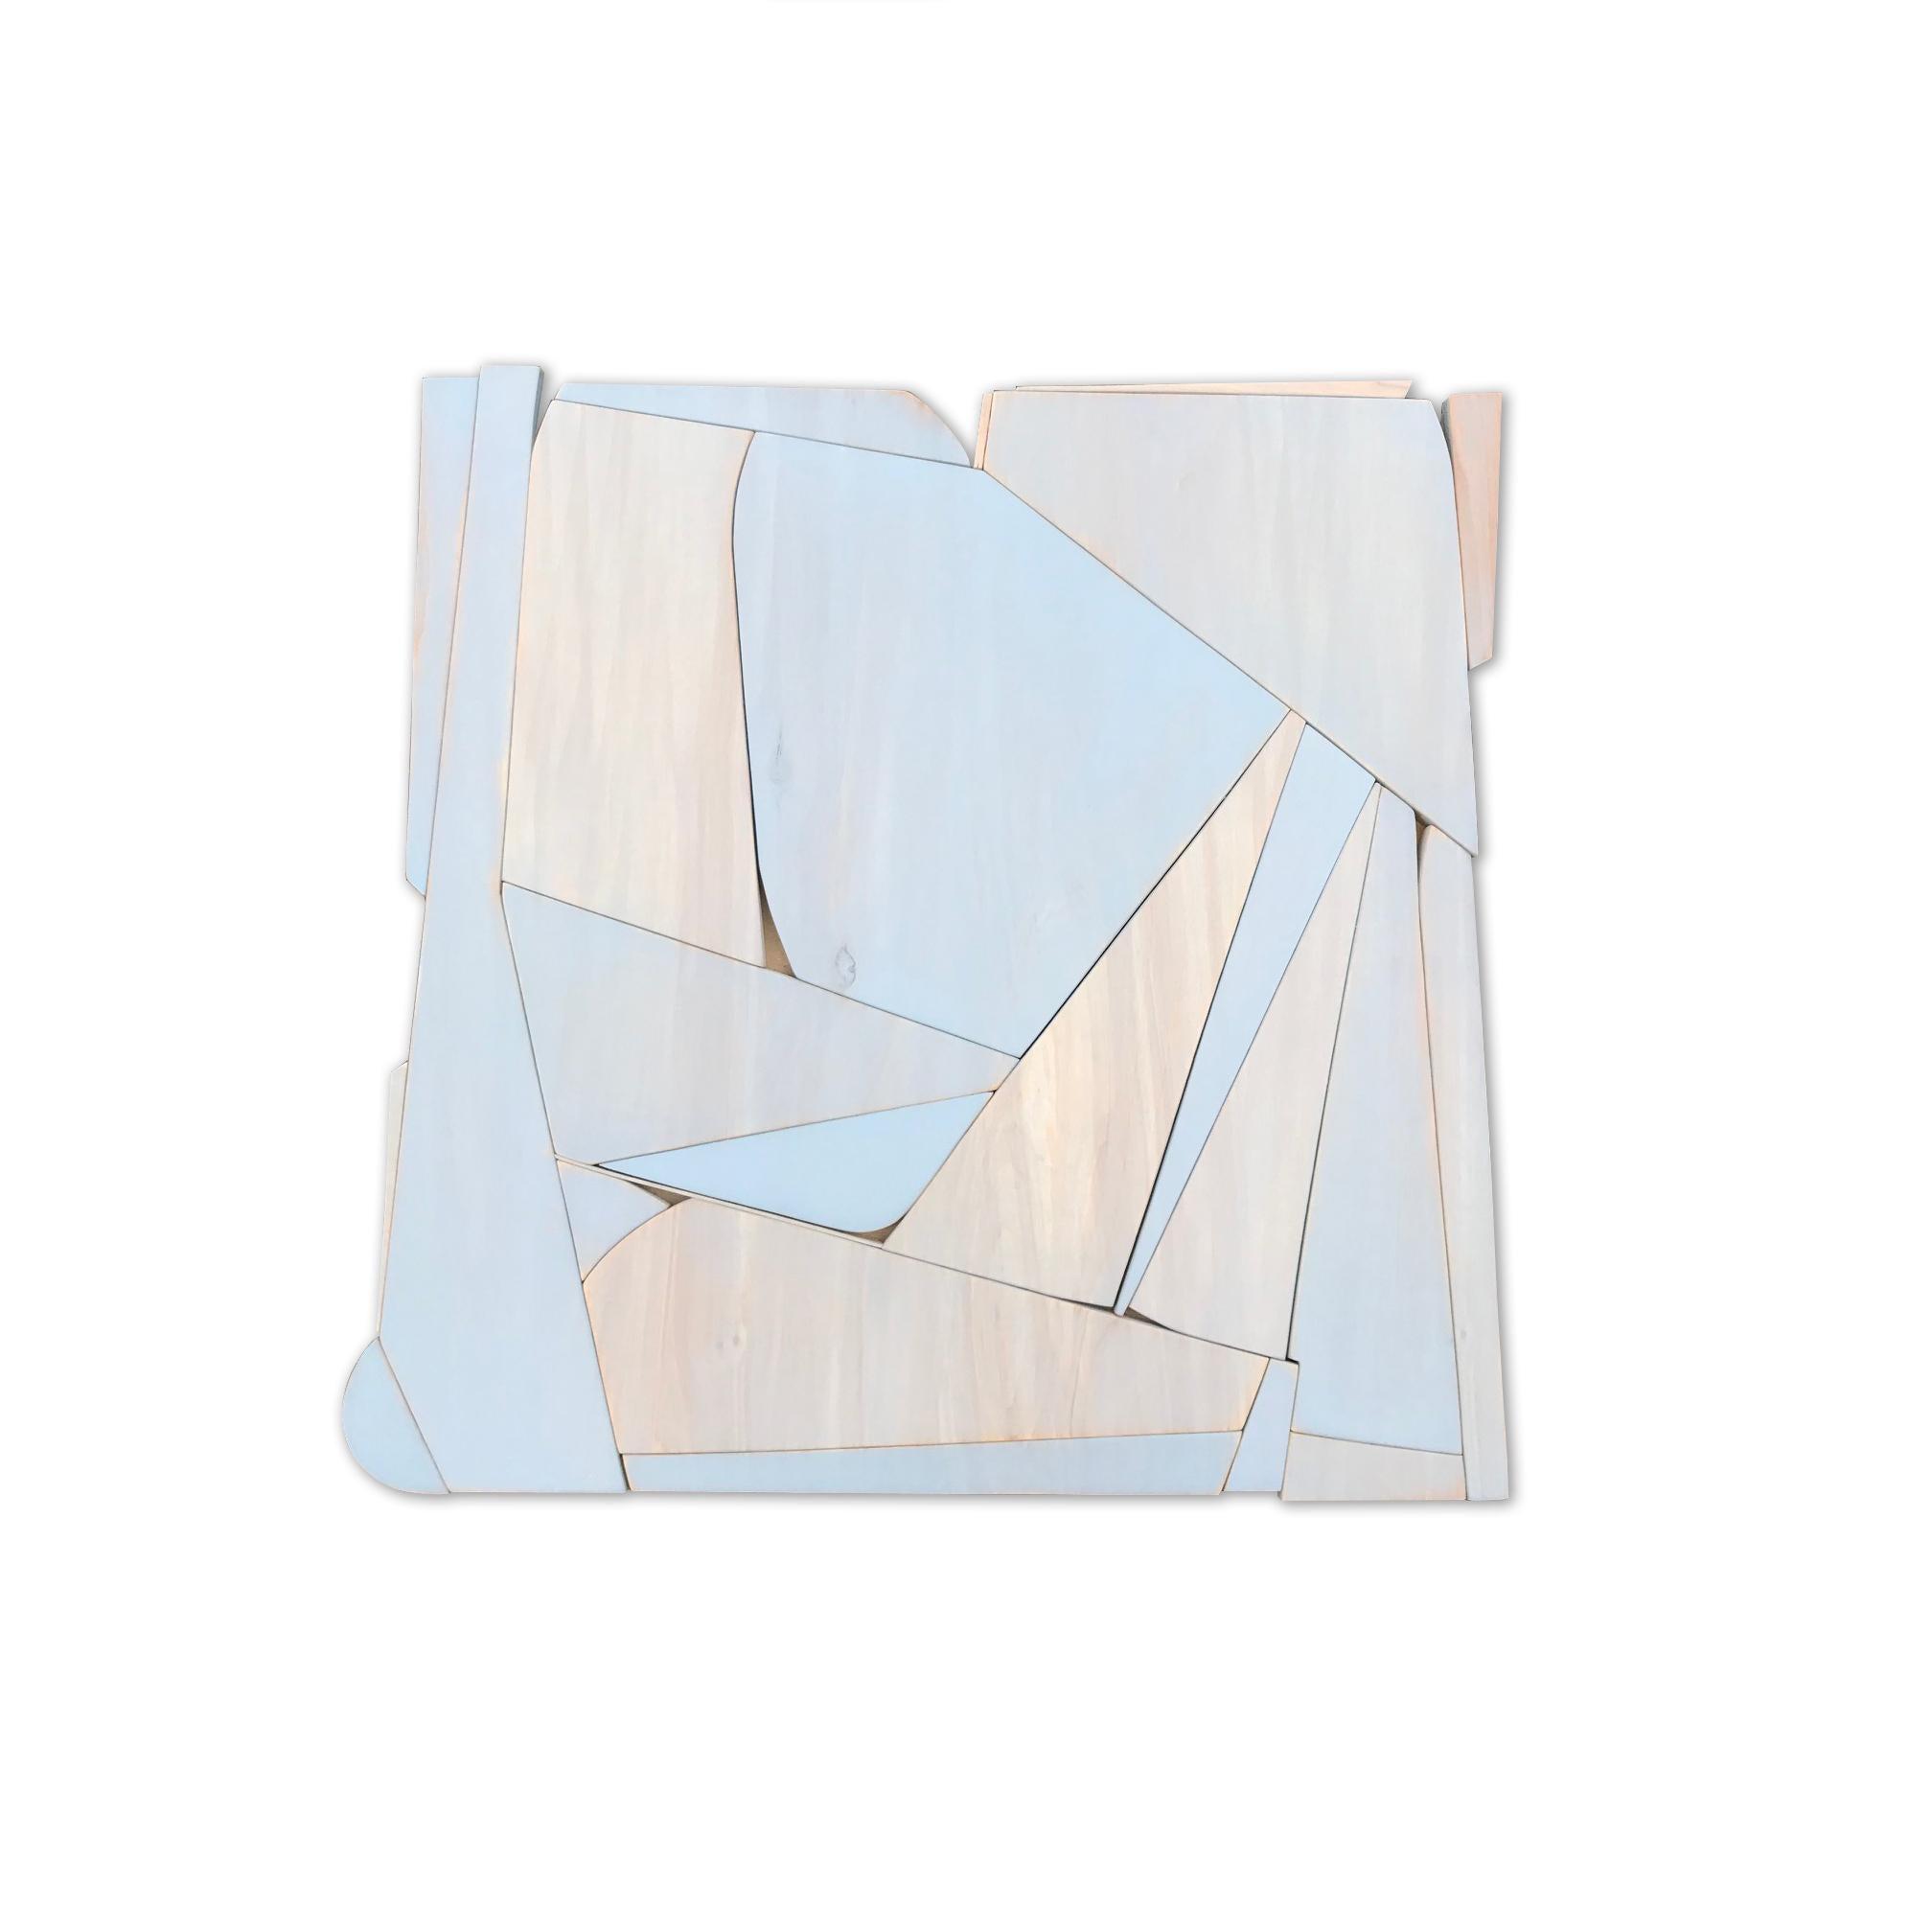 Myrtle II (modern abstract wall sculpture minimal geometric design neutrals)